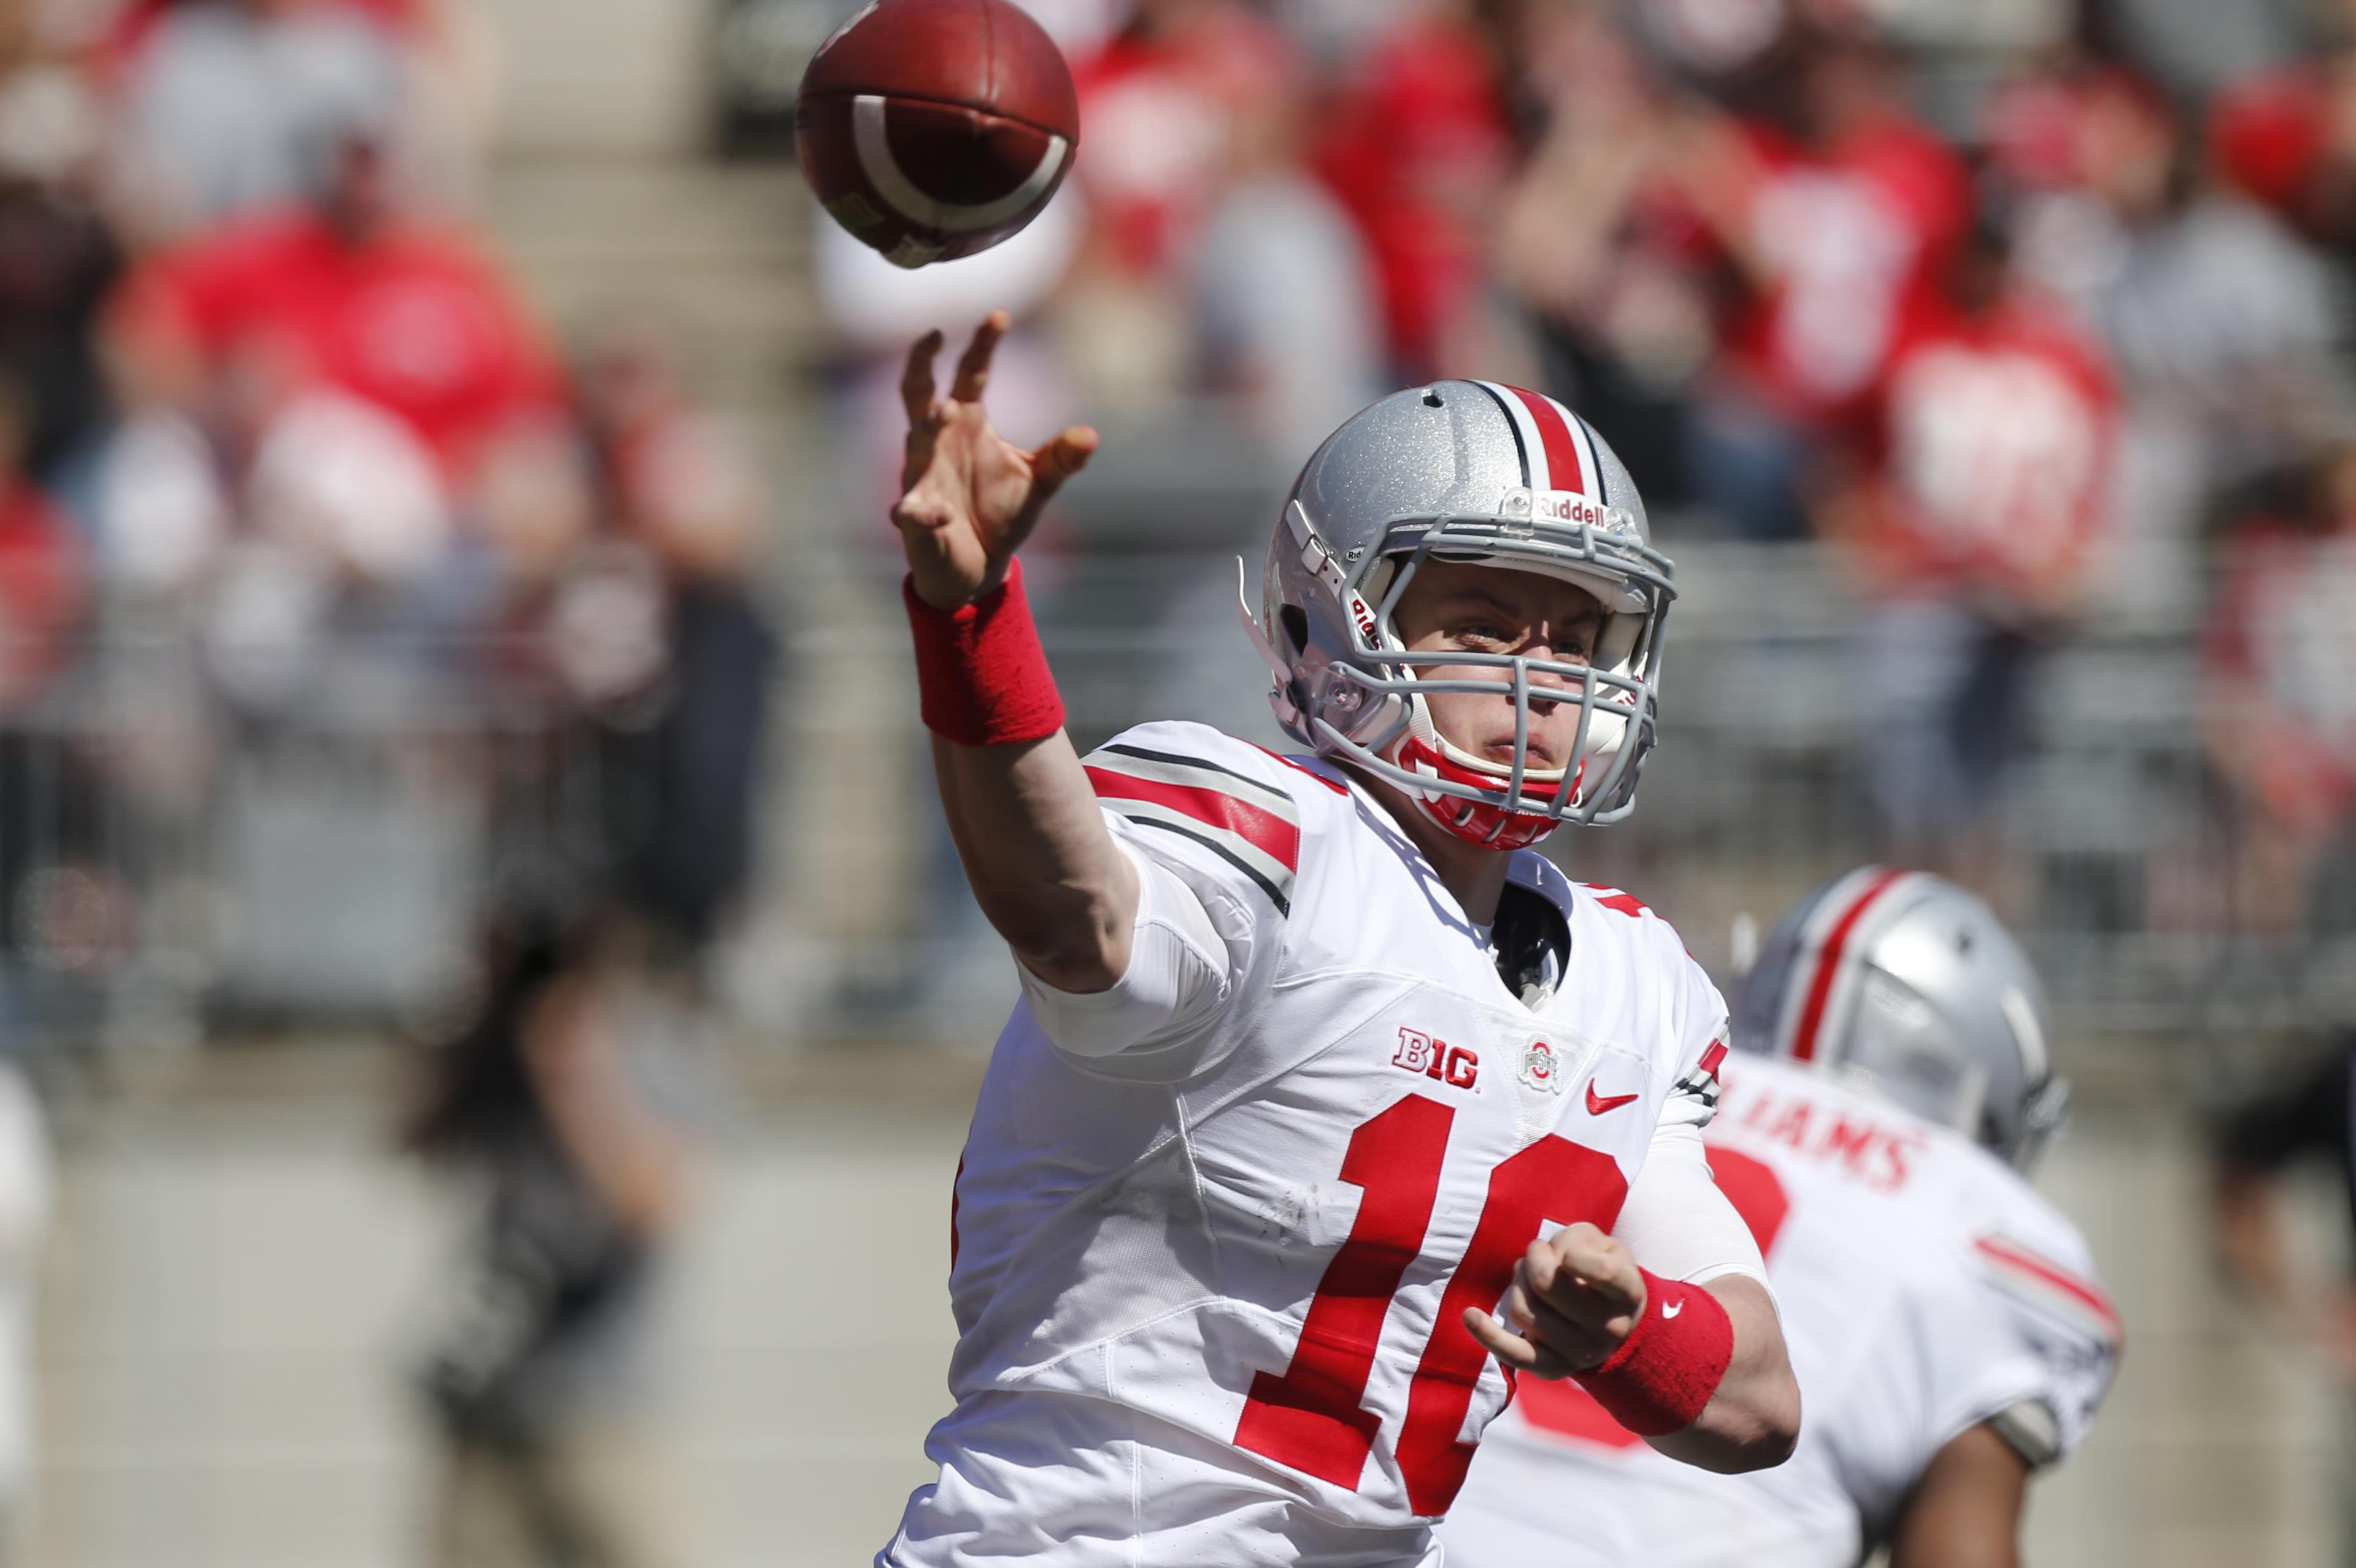 Ohio State quarterback Joe Burrow throws a pass during Ohio State's NCAA college football spring game Saturday, April 16, 2016, in Columbus, Ohio. (AP Photo/Jay LaPrete)